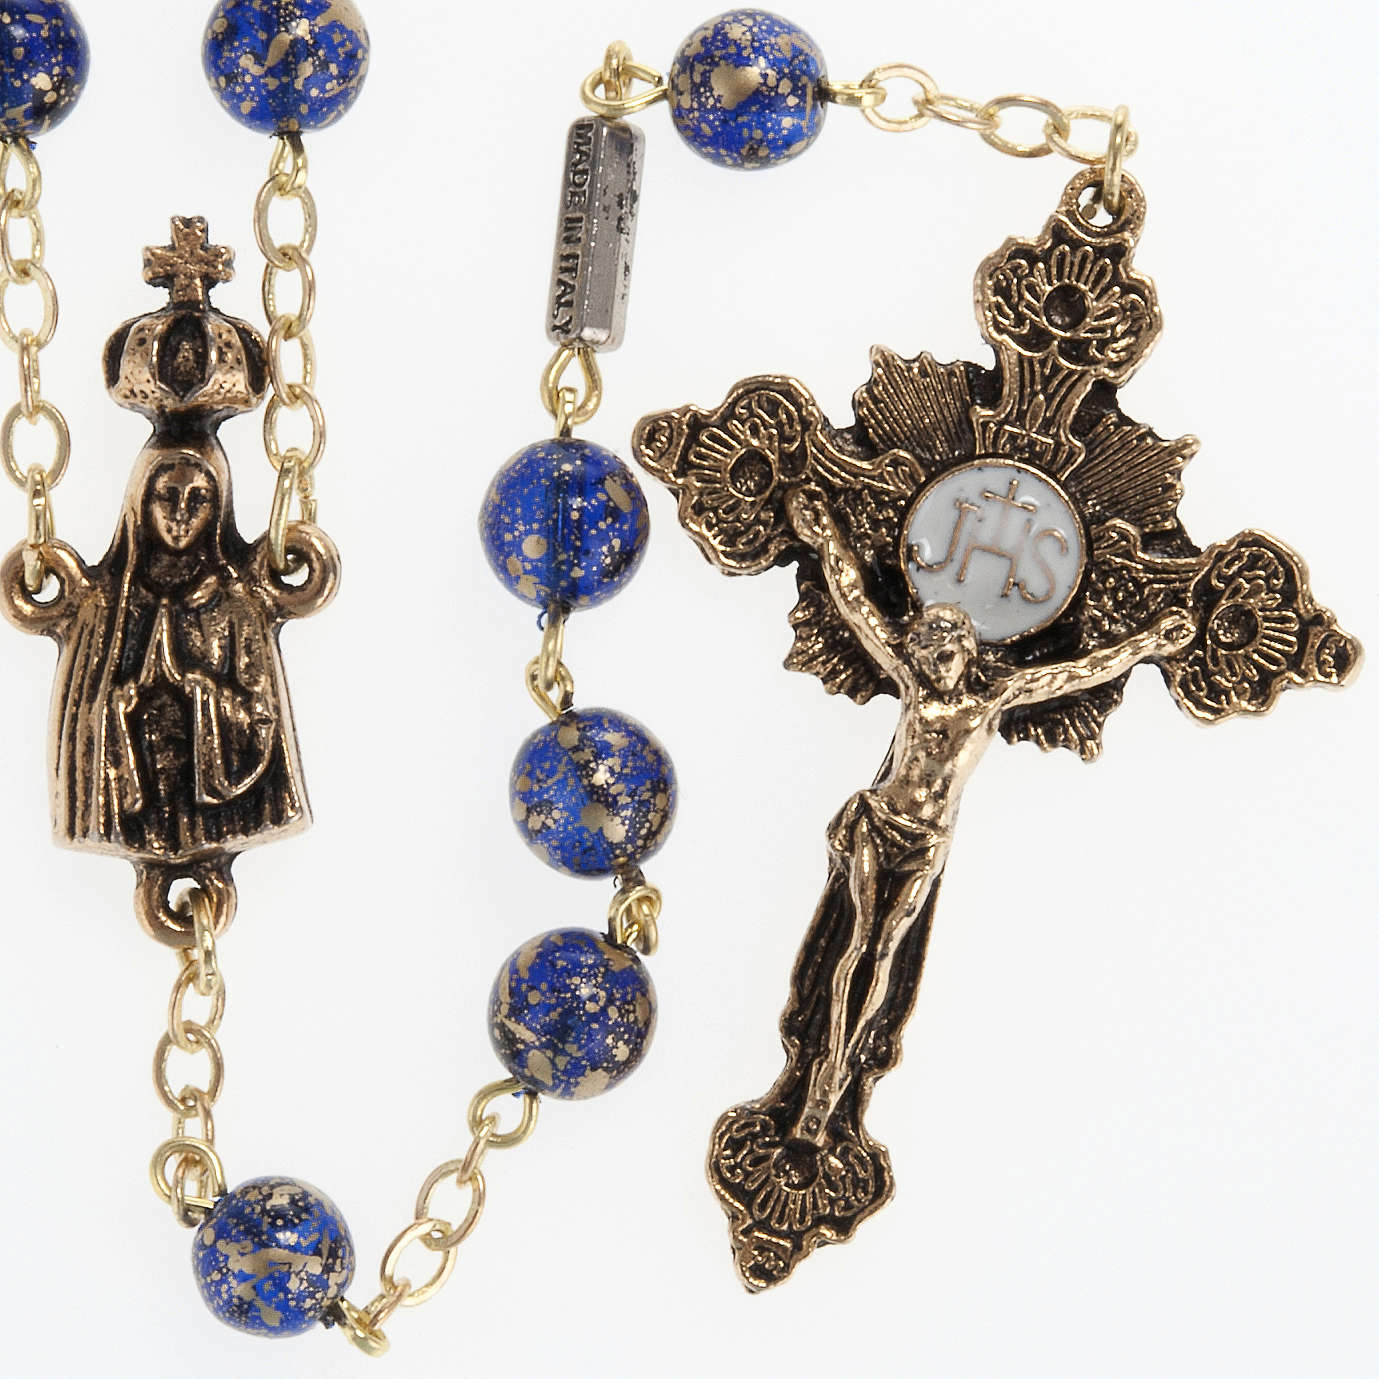 Chapelet Ghirelli Notre Dame de Fatima bleu et or 6 mm 4